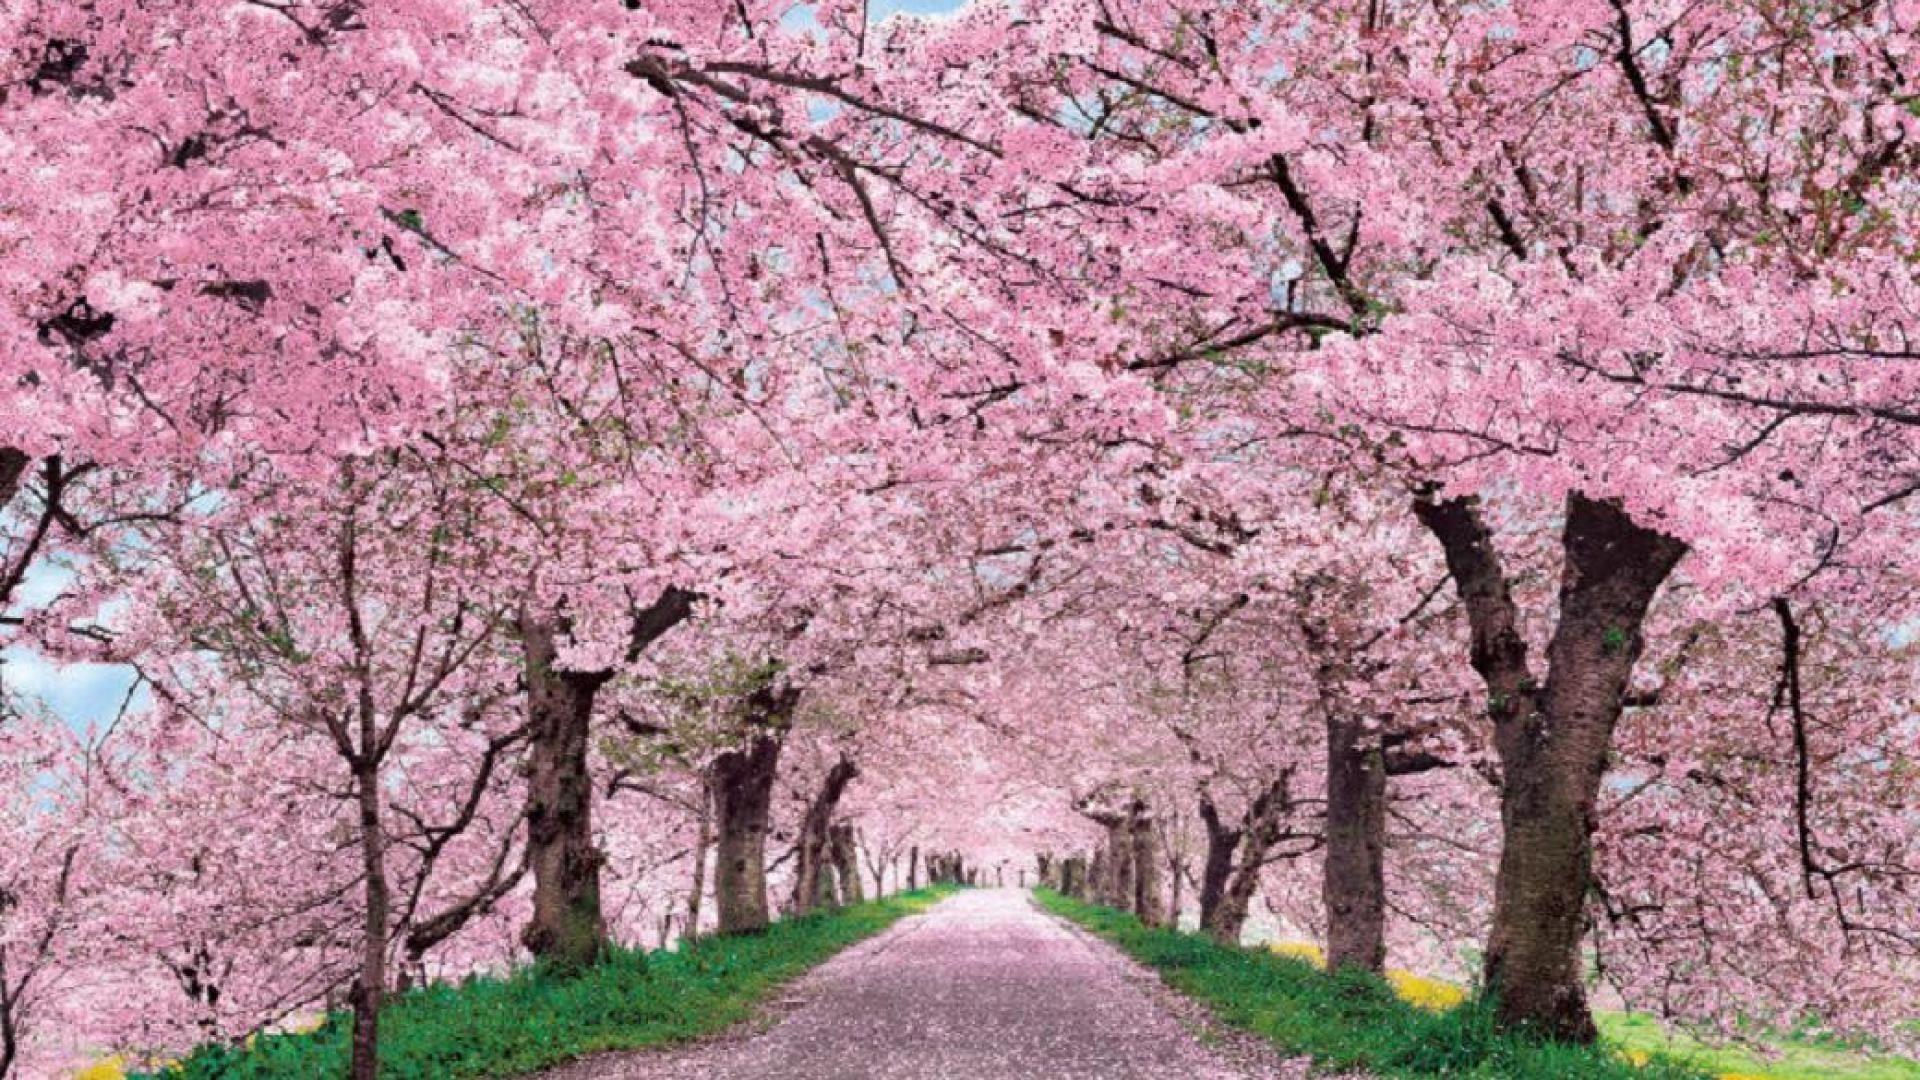 cherry blossom desktop wallpaper wallpapertag. Black Bedroom Furniture Sets. Home Design Ideas